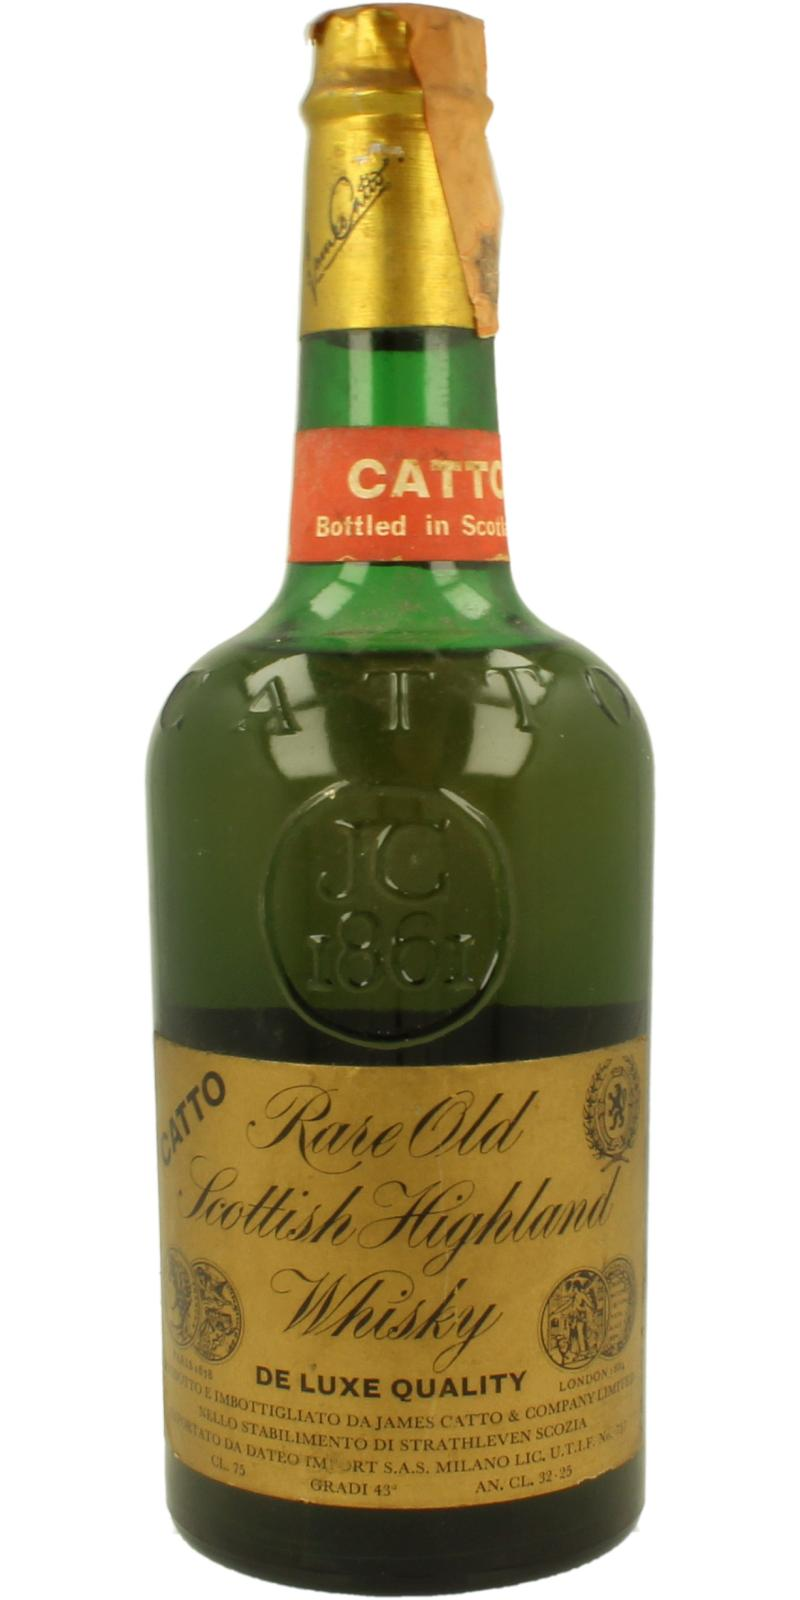 Catto Rare Old Scottish Highland Whisky